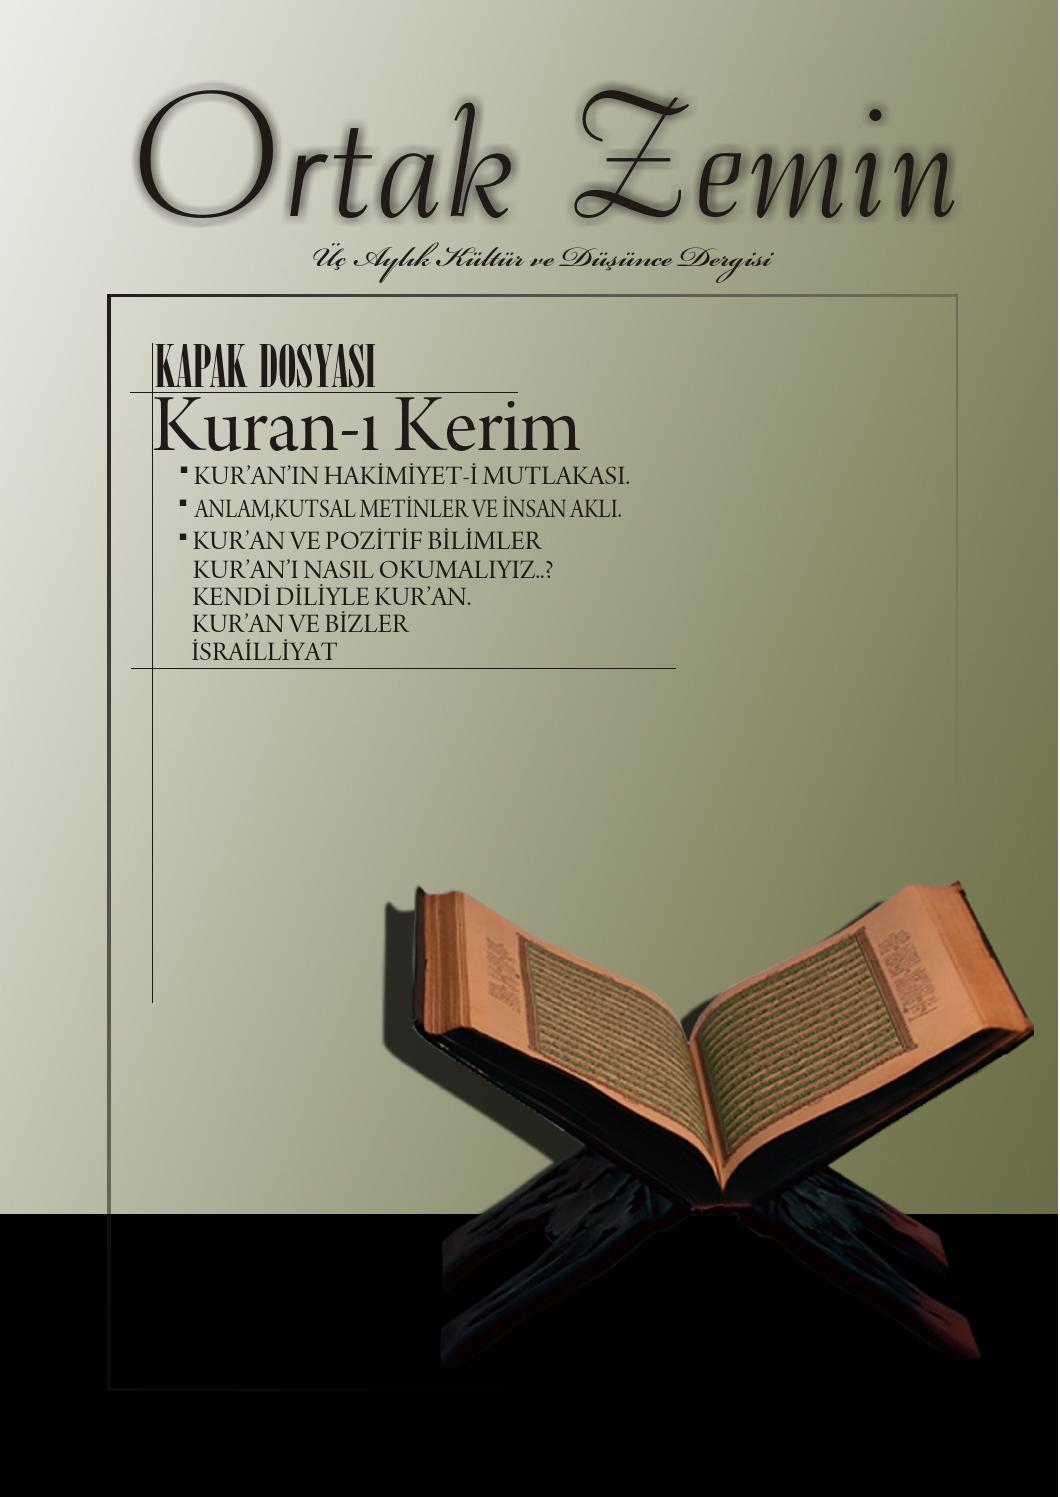 Ortakzemin Sayi 2 By Ahmet Celik Issuu